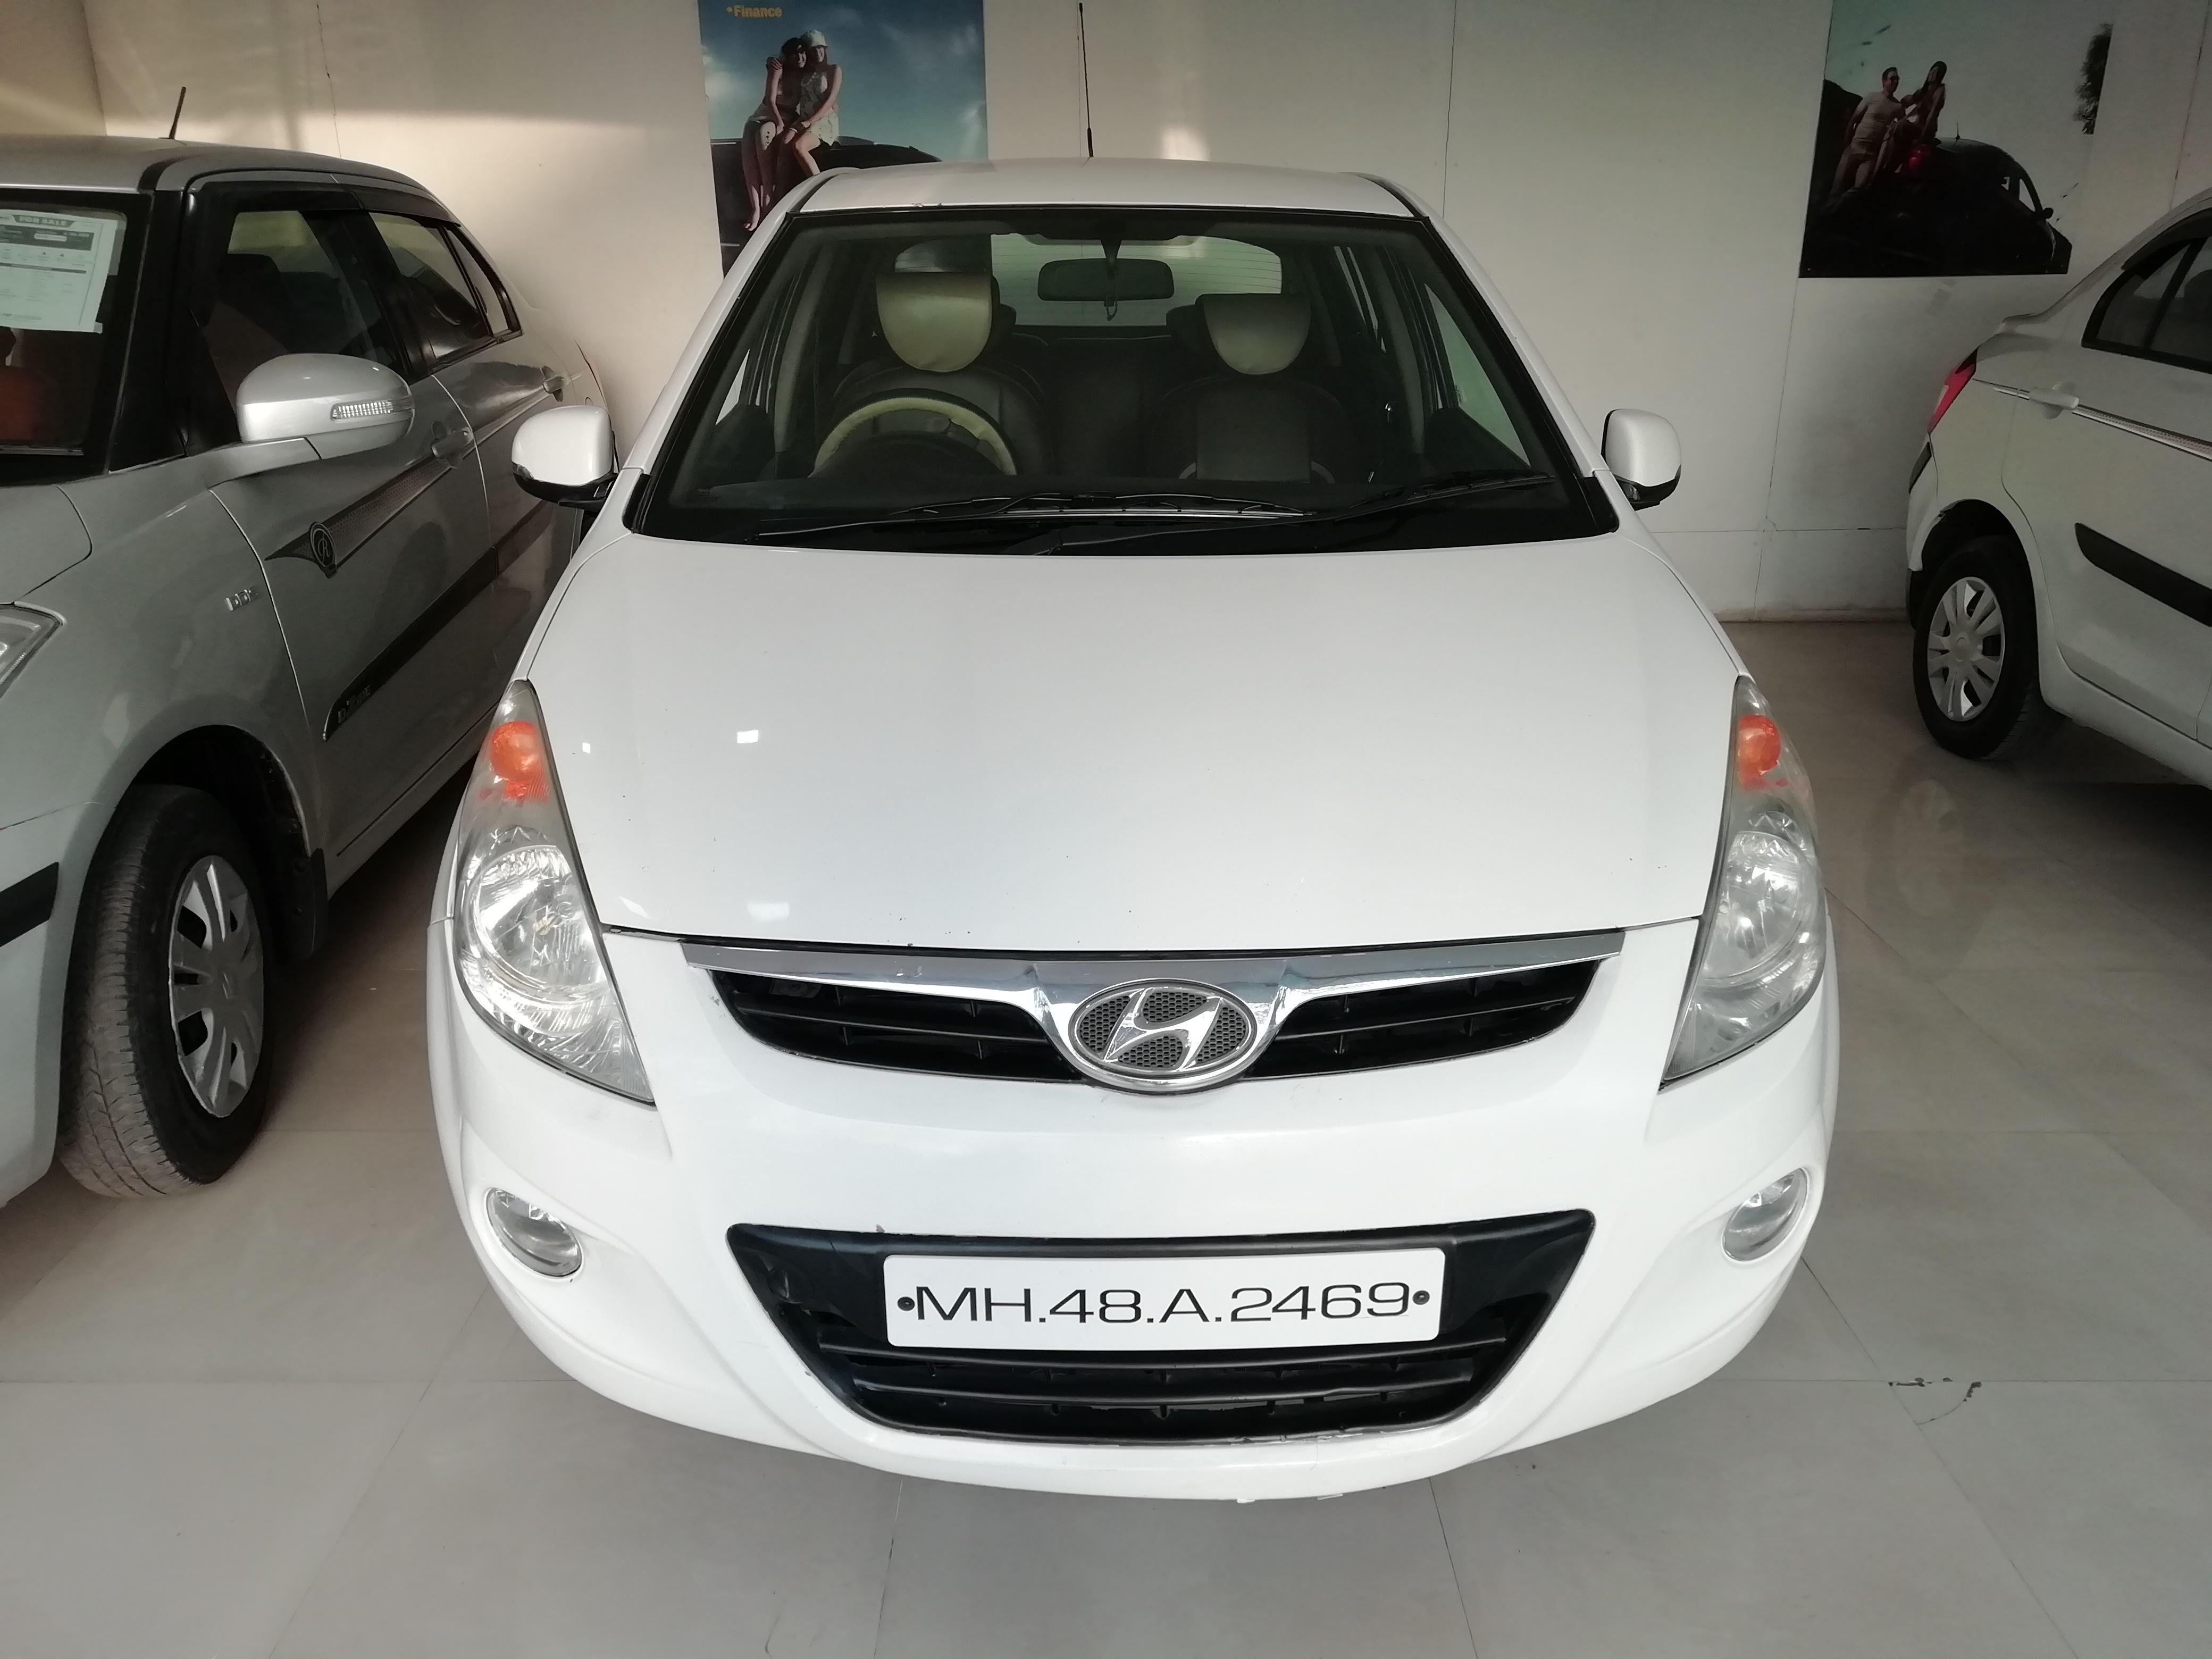 2011 Used Hyundai I20 SPORTZ 1.2 BS IV